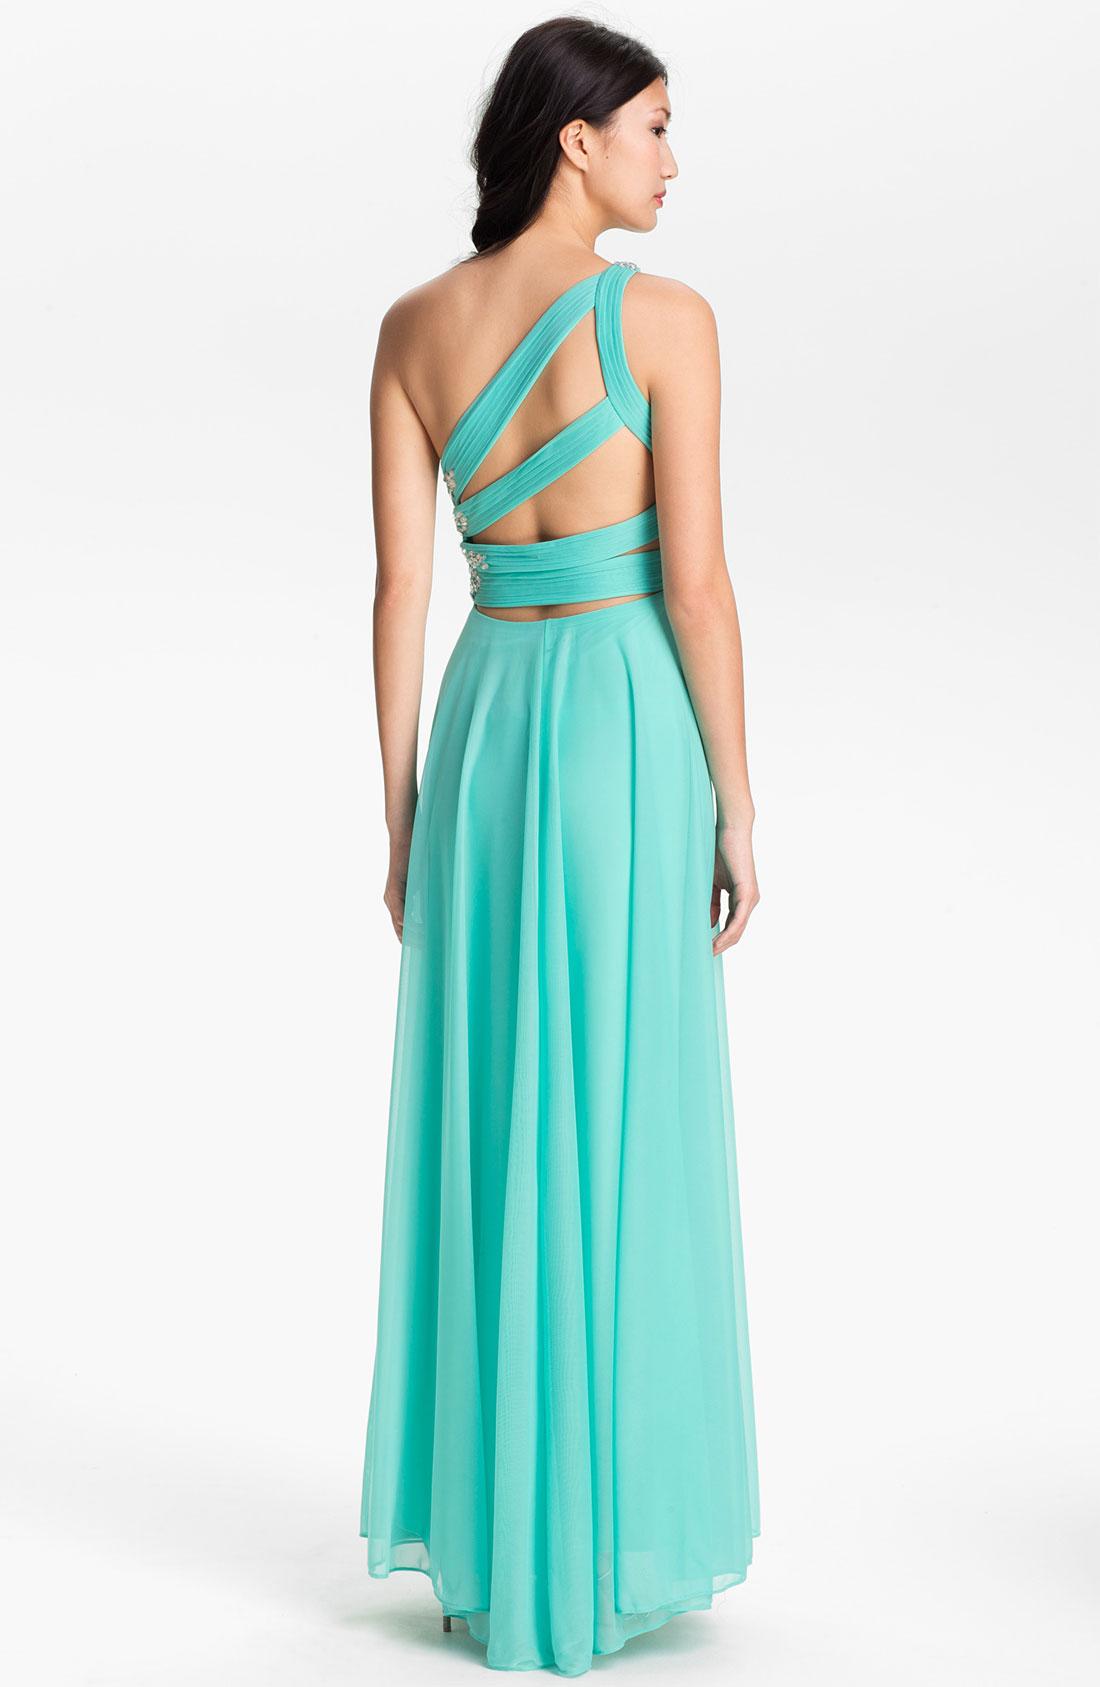 Turmec » xscape one shoulder glitter dress